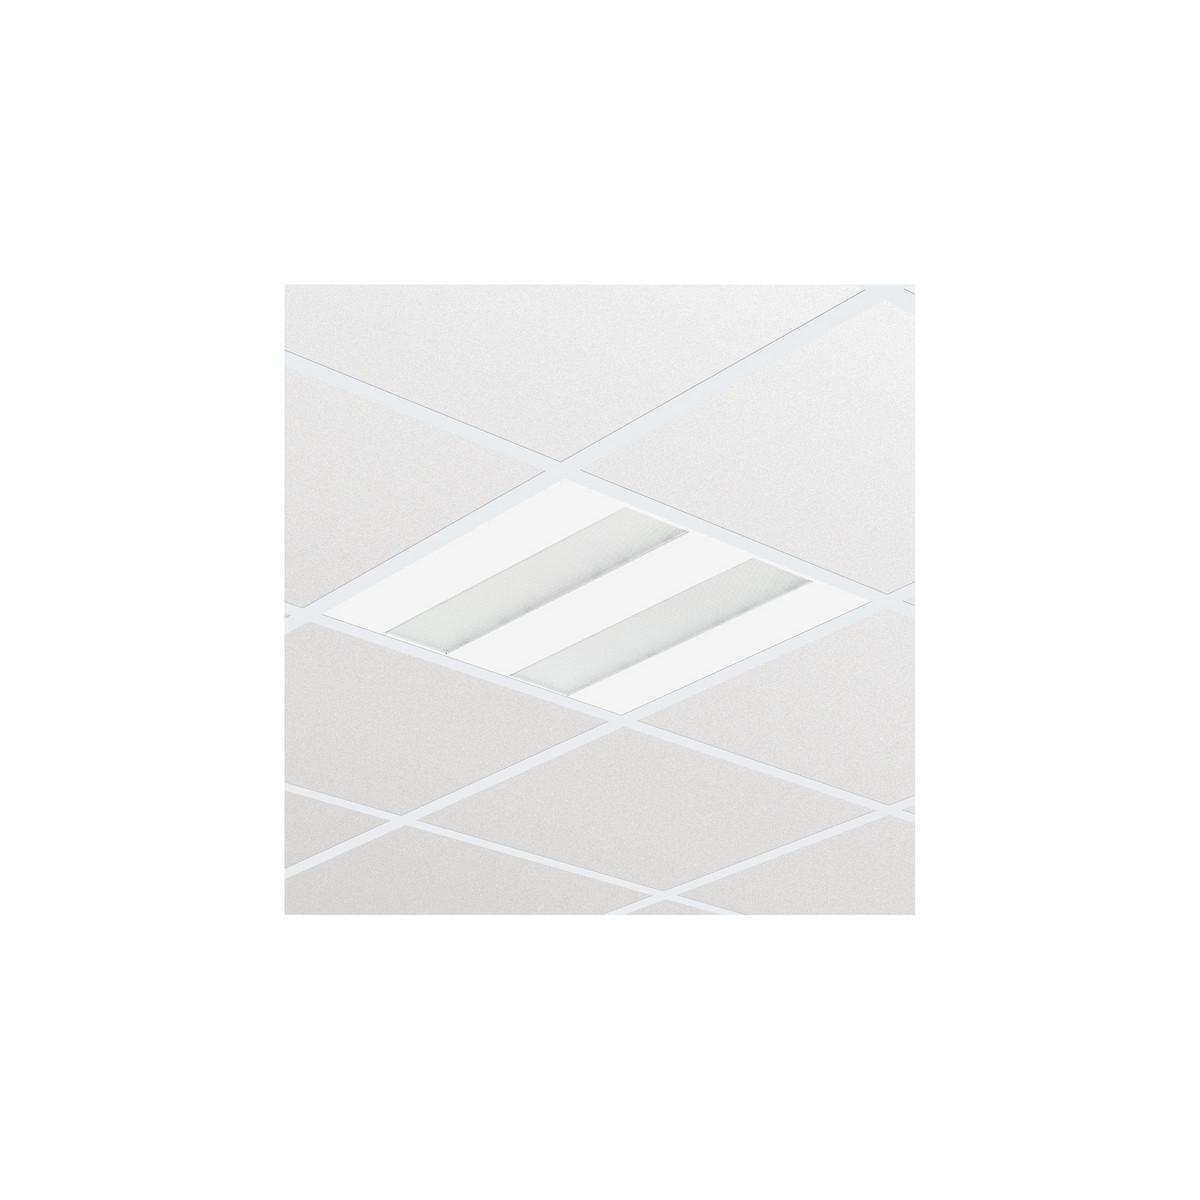 Philips FlexBlend Indbyg RC340B LED 4200lm/940 60x60 Synlig T-skinne PCS-optik